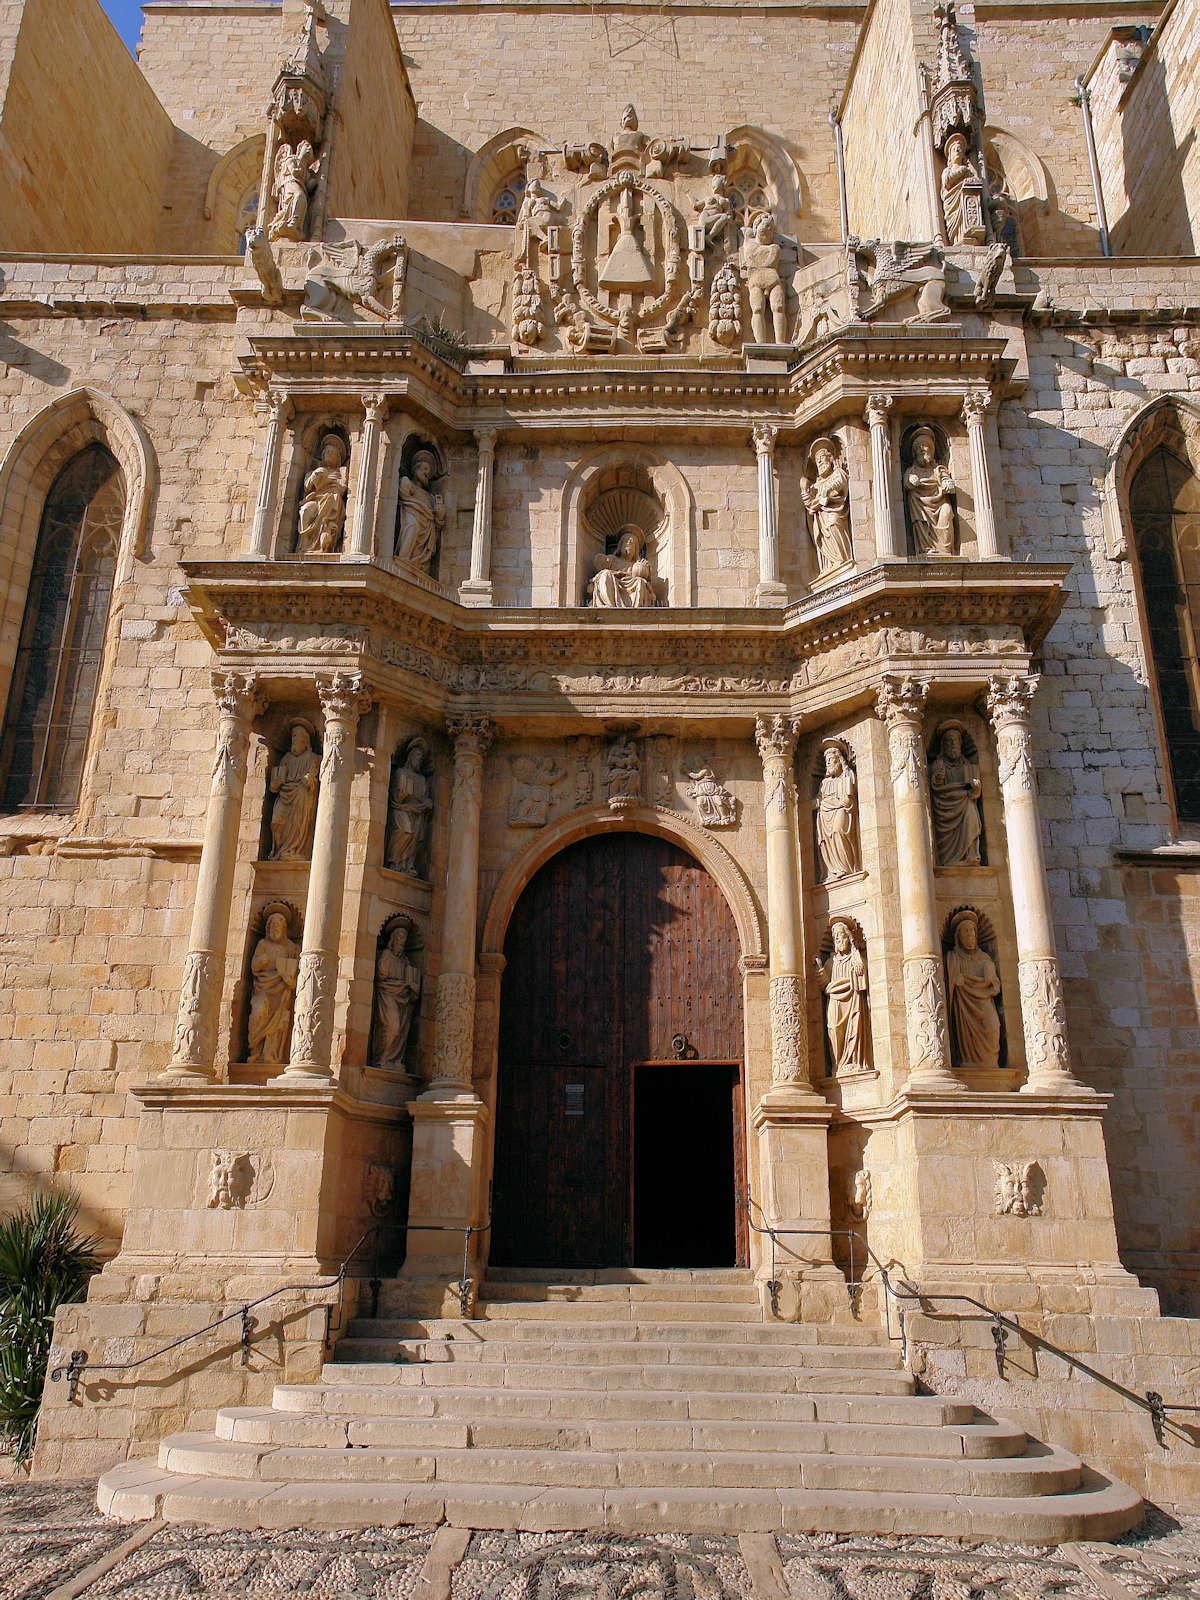 Iglesia-de-Santa-Mara-La-Mayor-Montblanc-Tarragona-